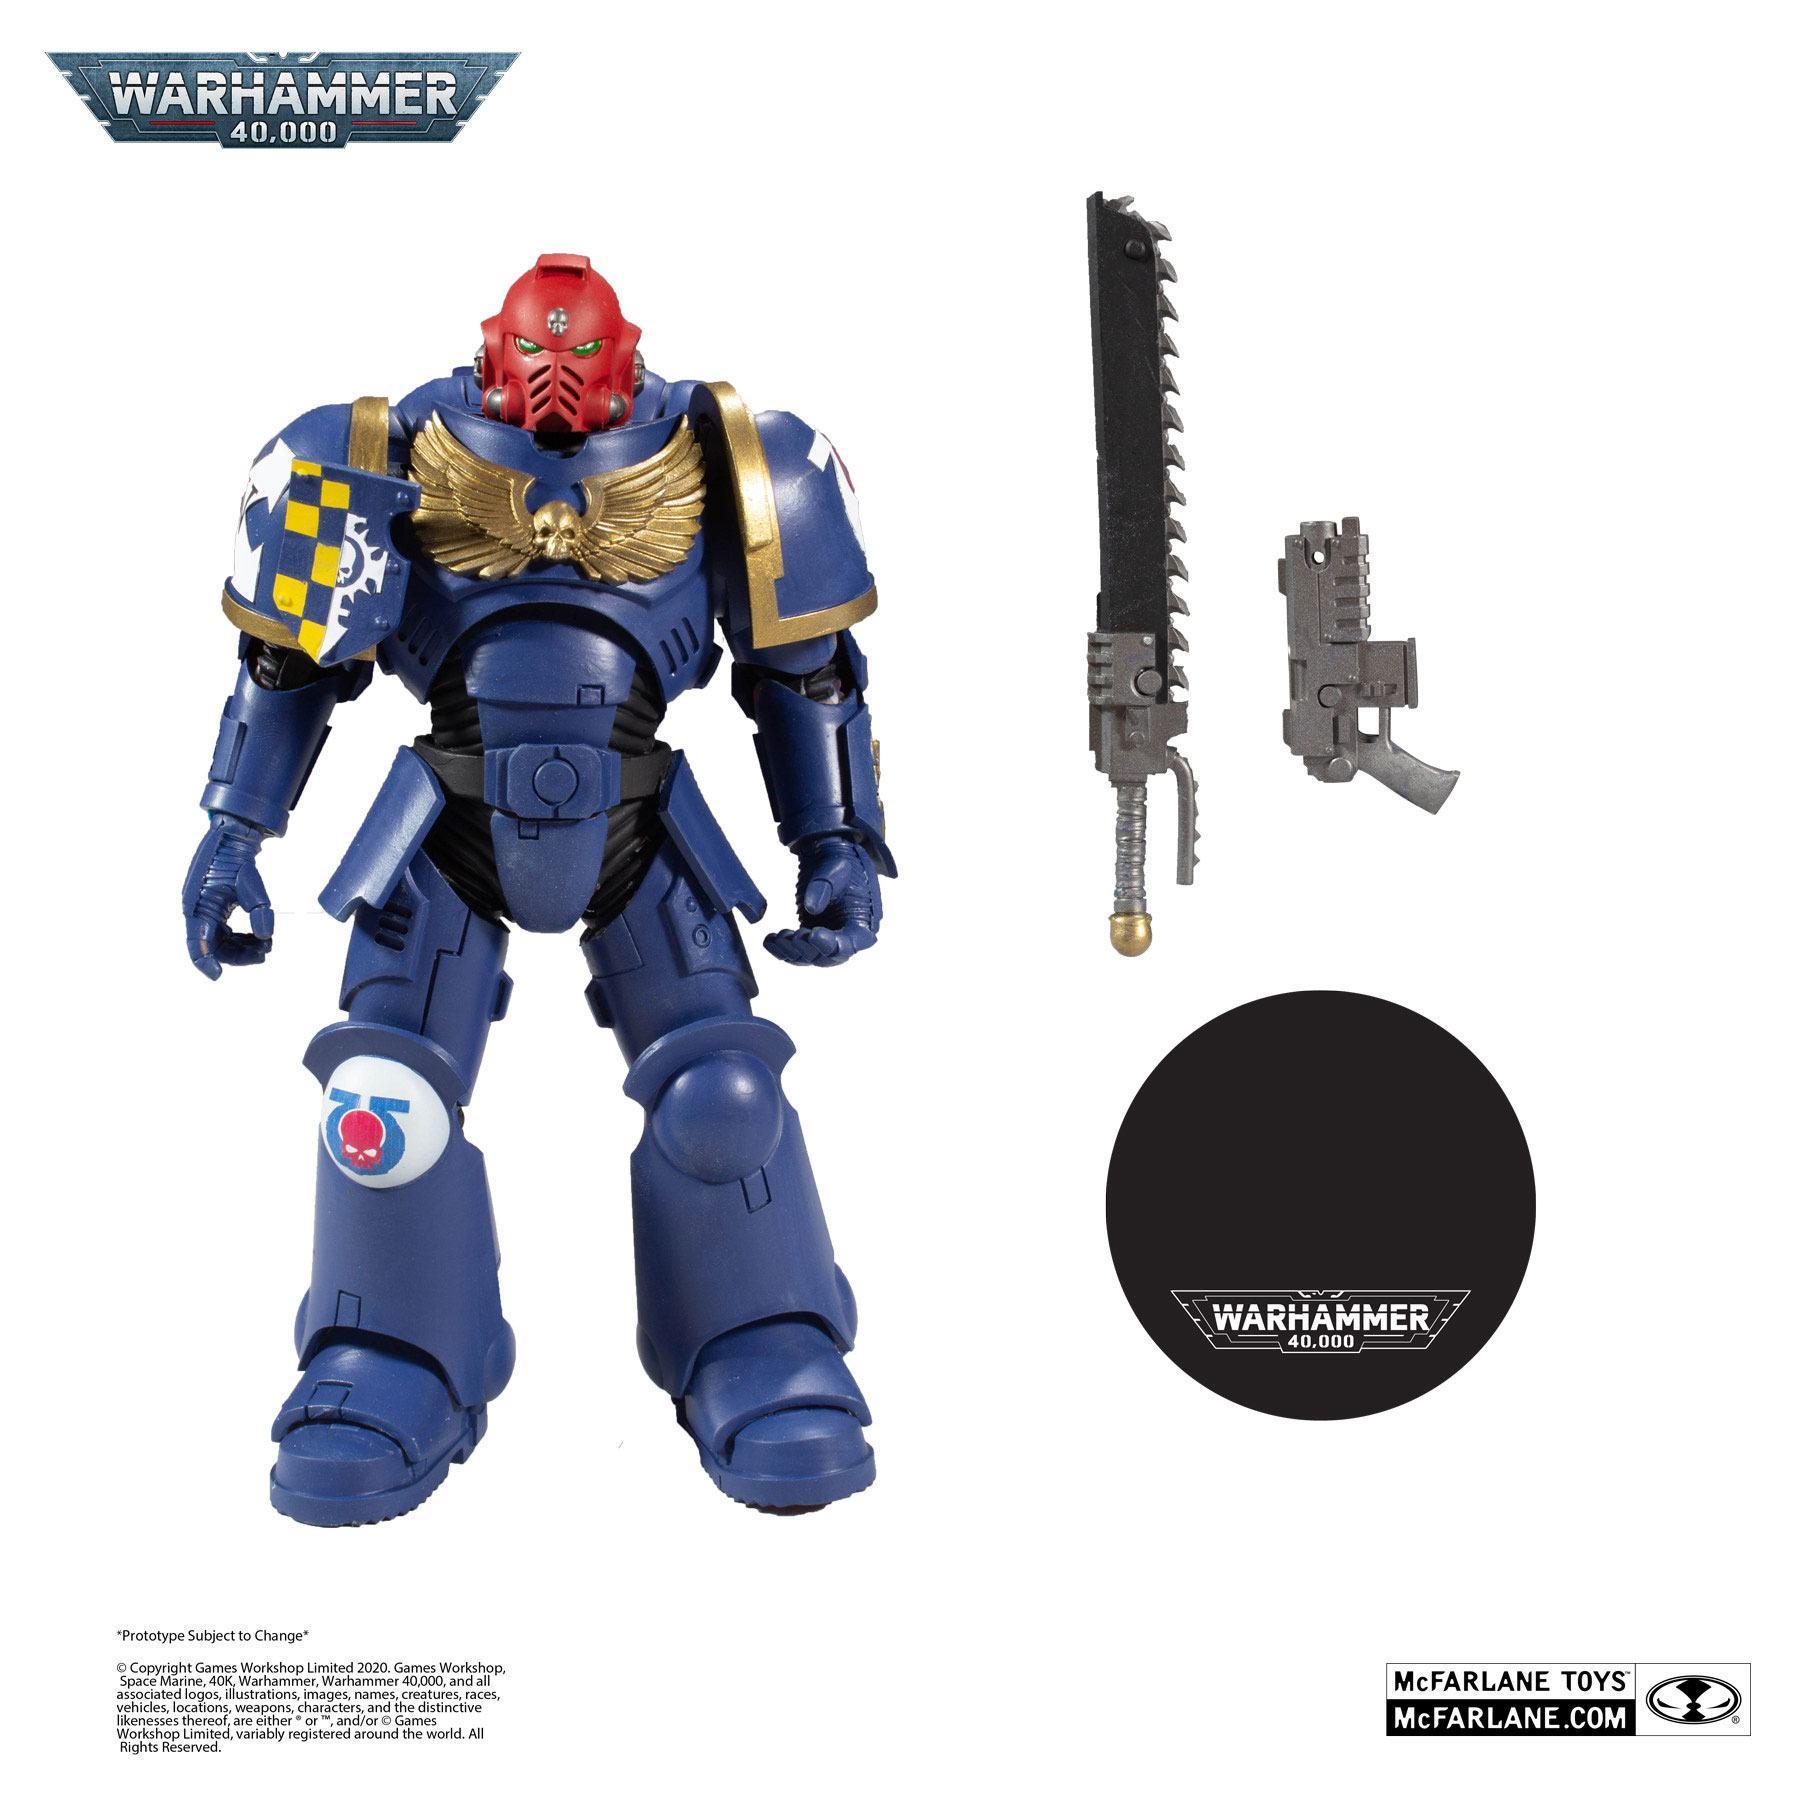 Suukoo toys figurine warhammer marine space 4